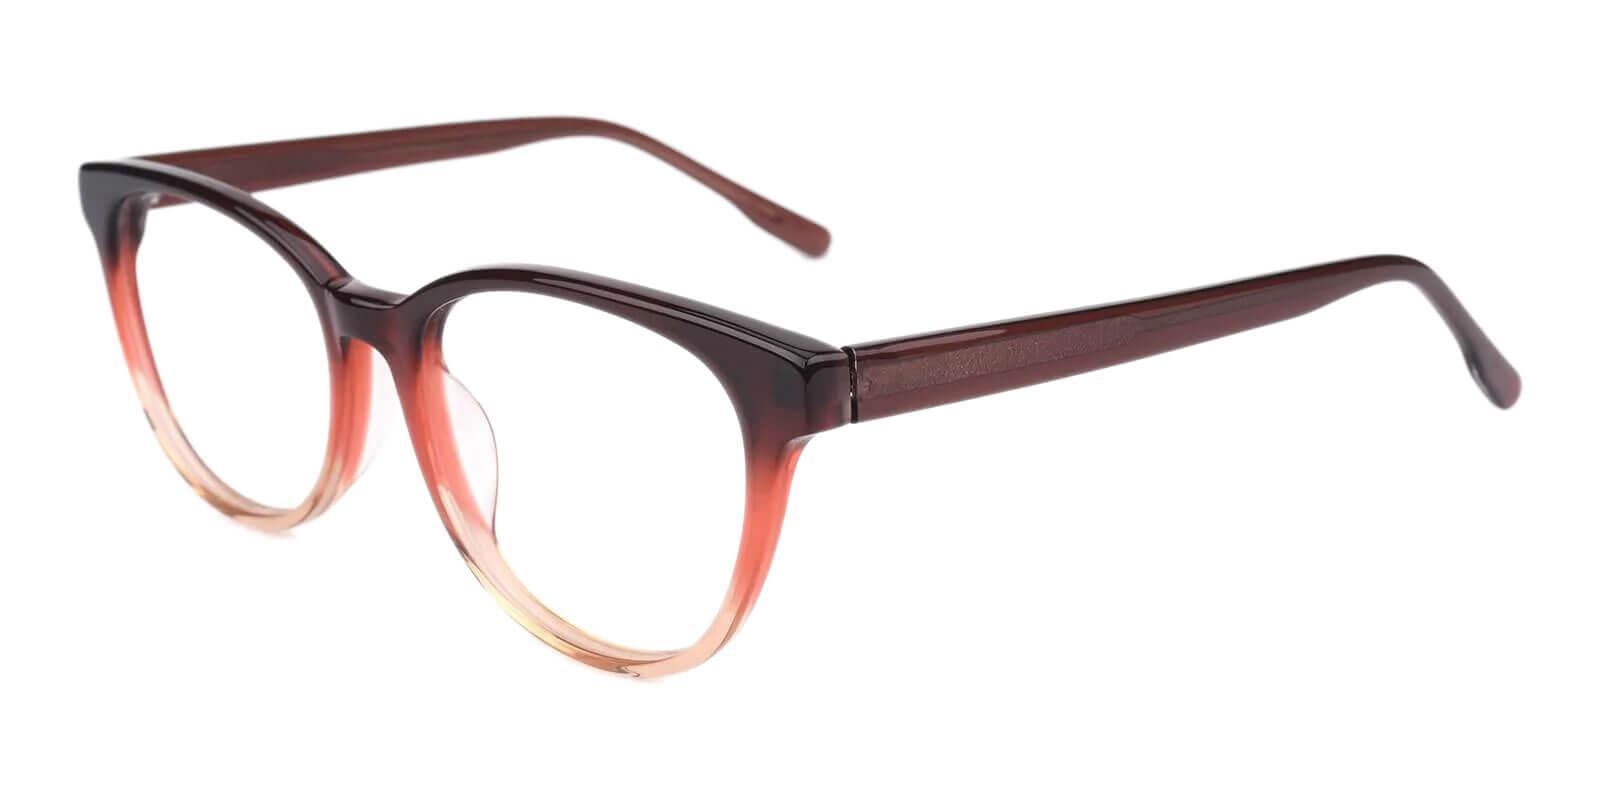 Bouquet Brown Acetate Eyeglasses , SpringHinges , UniversalBridgeFit Frames from ABBE Glasses